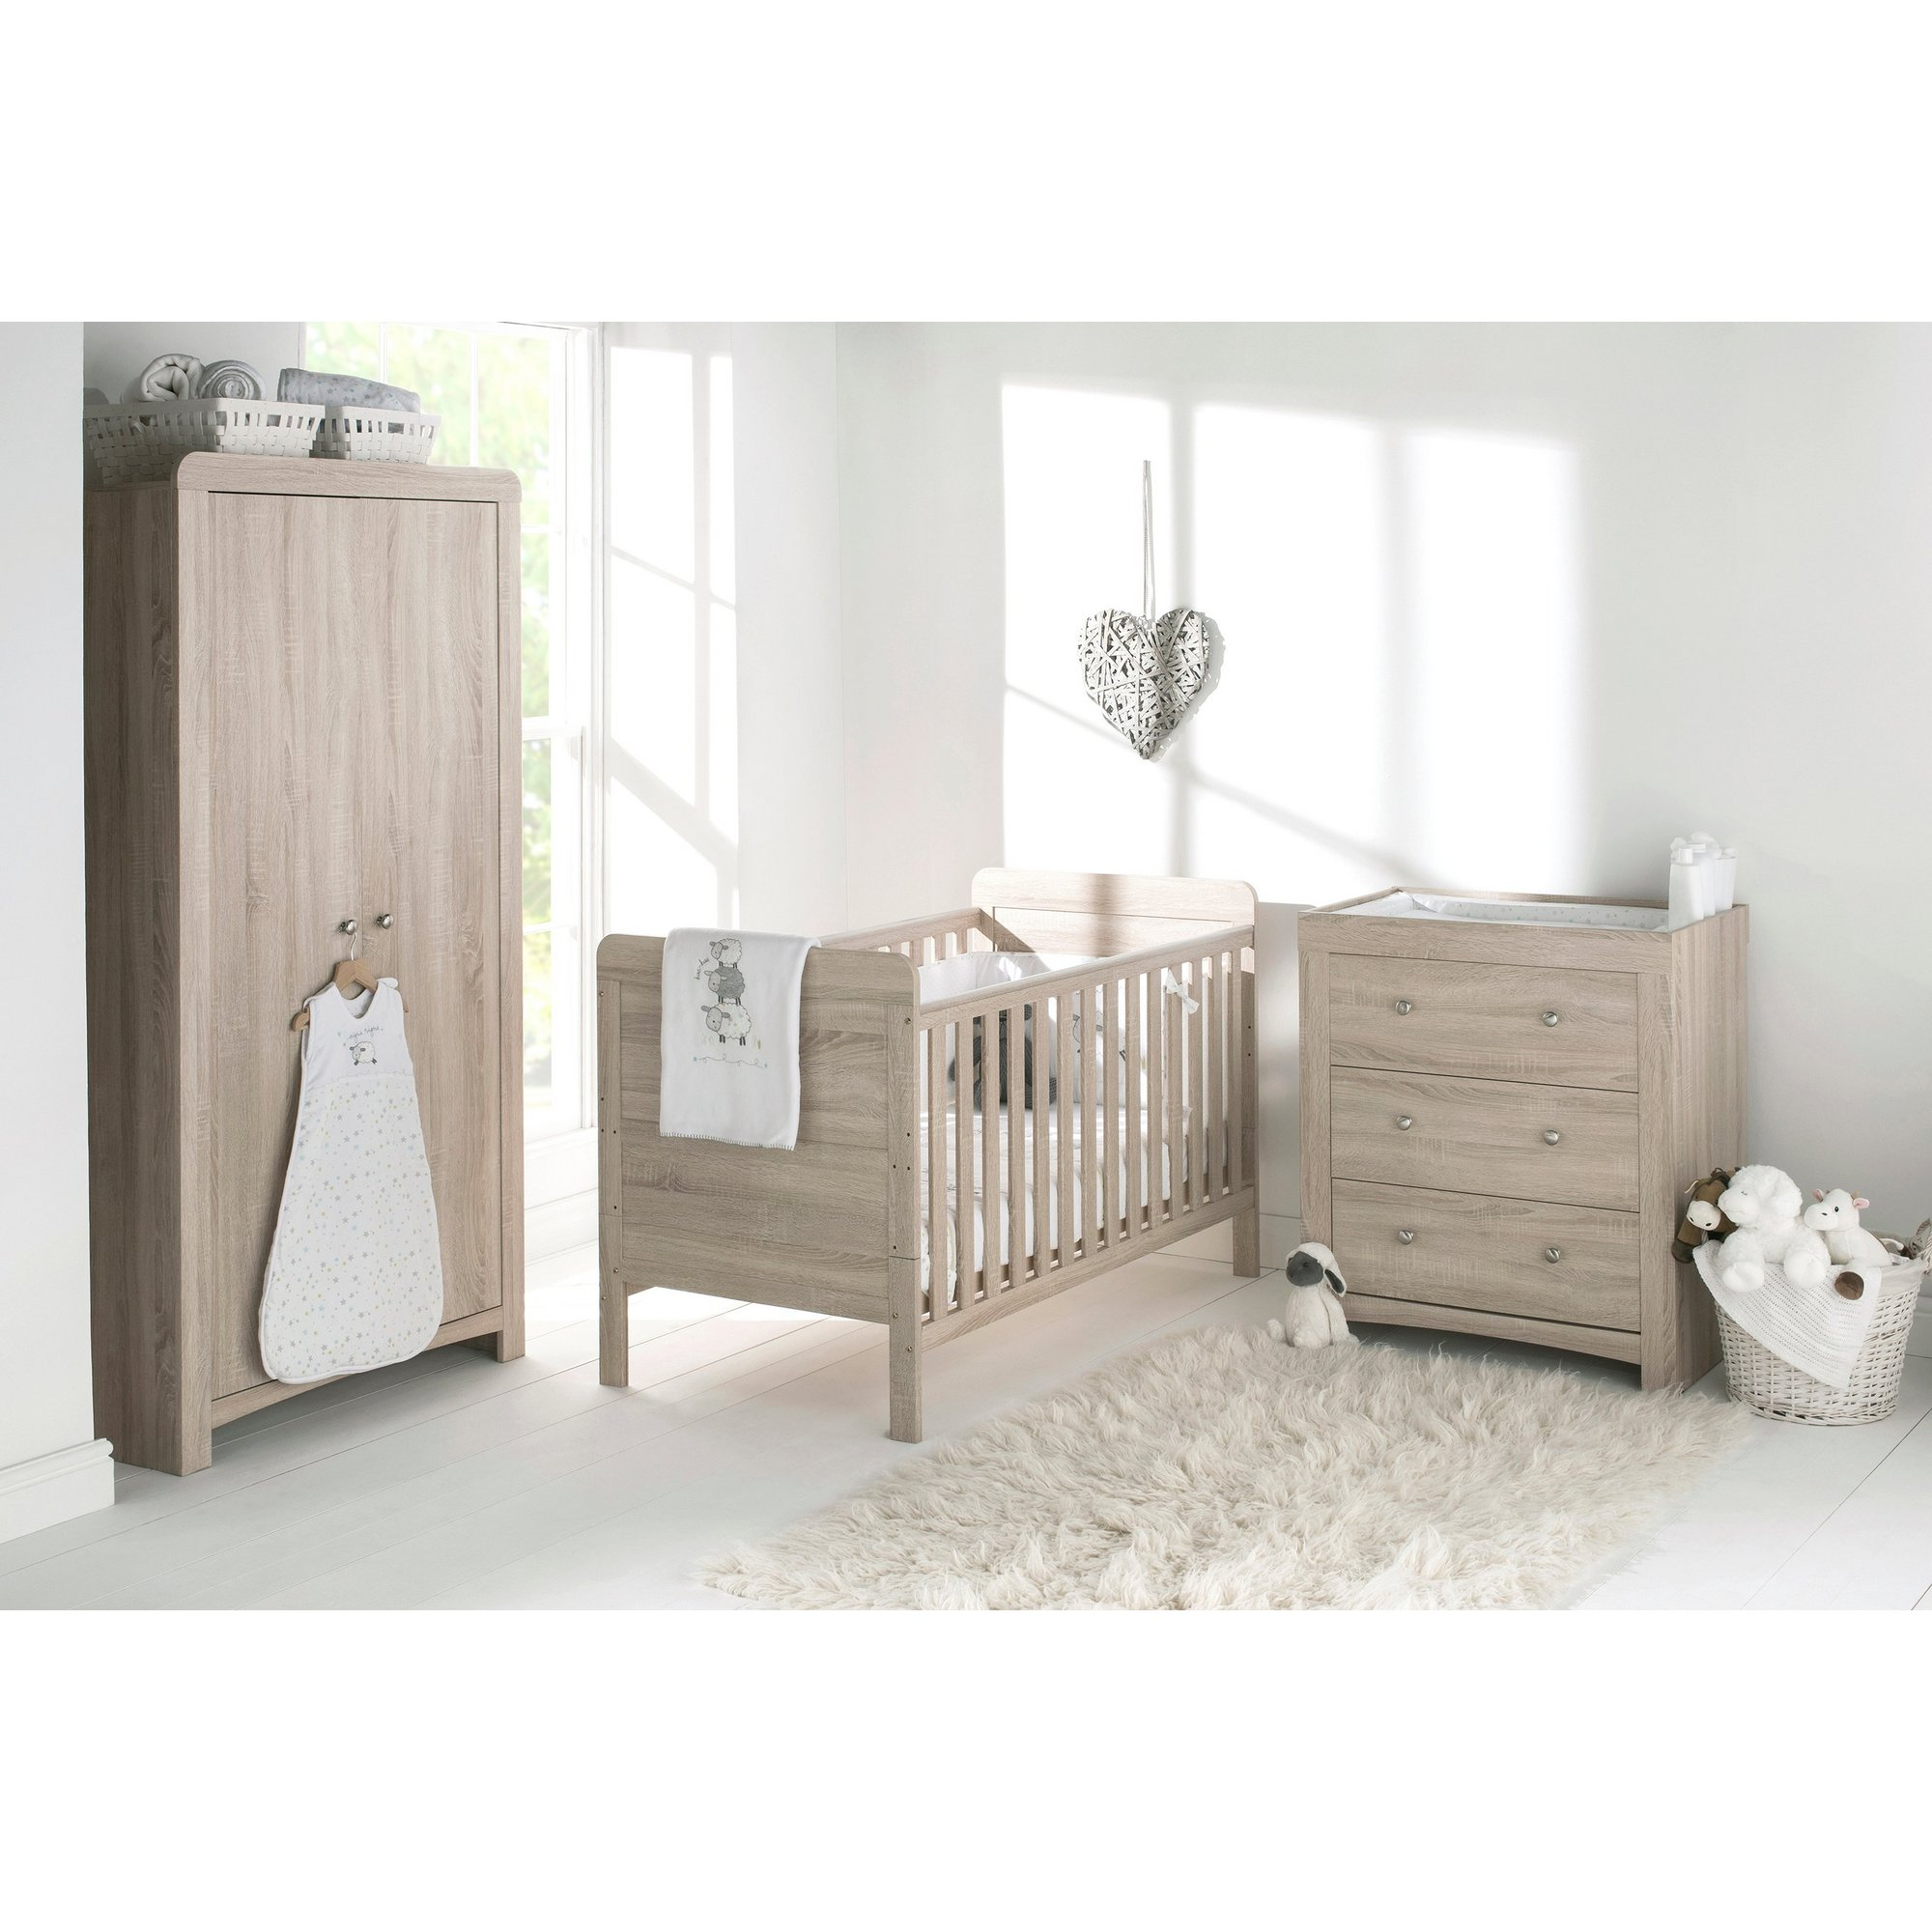 Image of Fontana 3-Piece Nursery Furniture Set